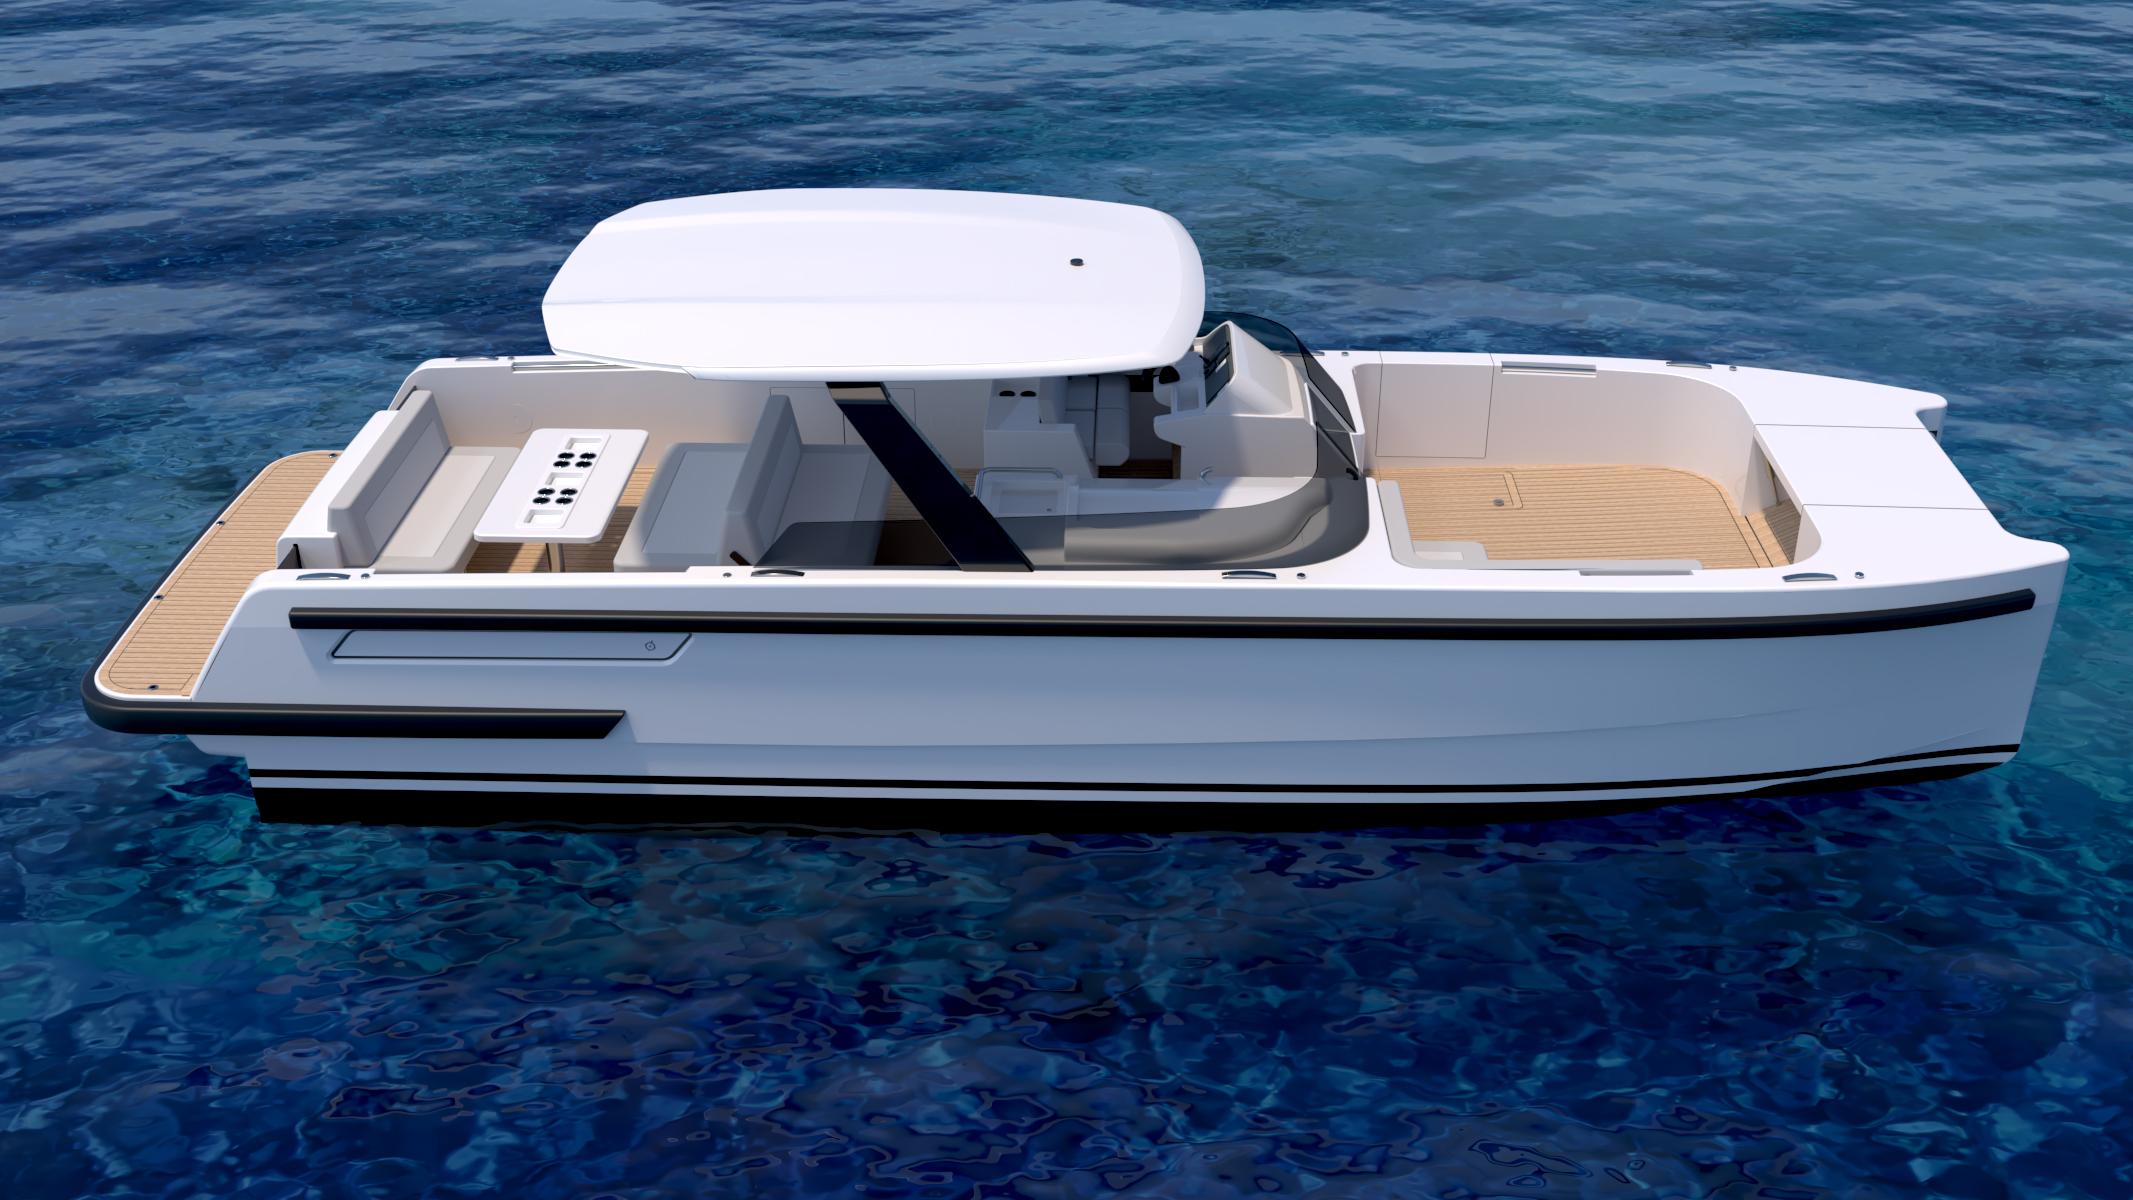 Compass Catamaran tender